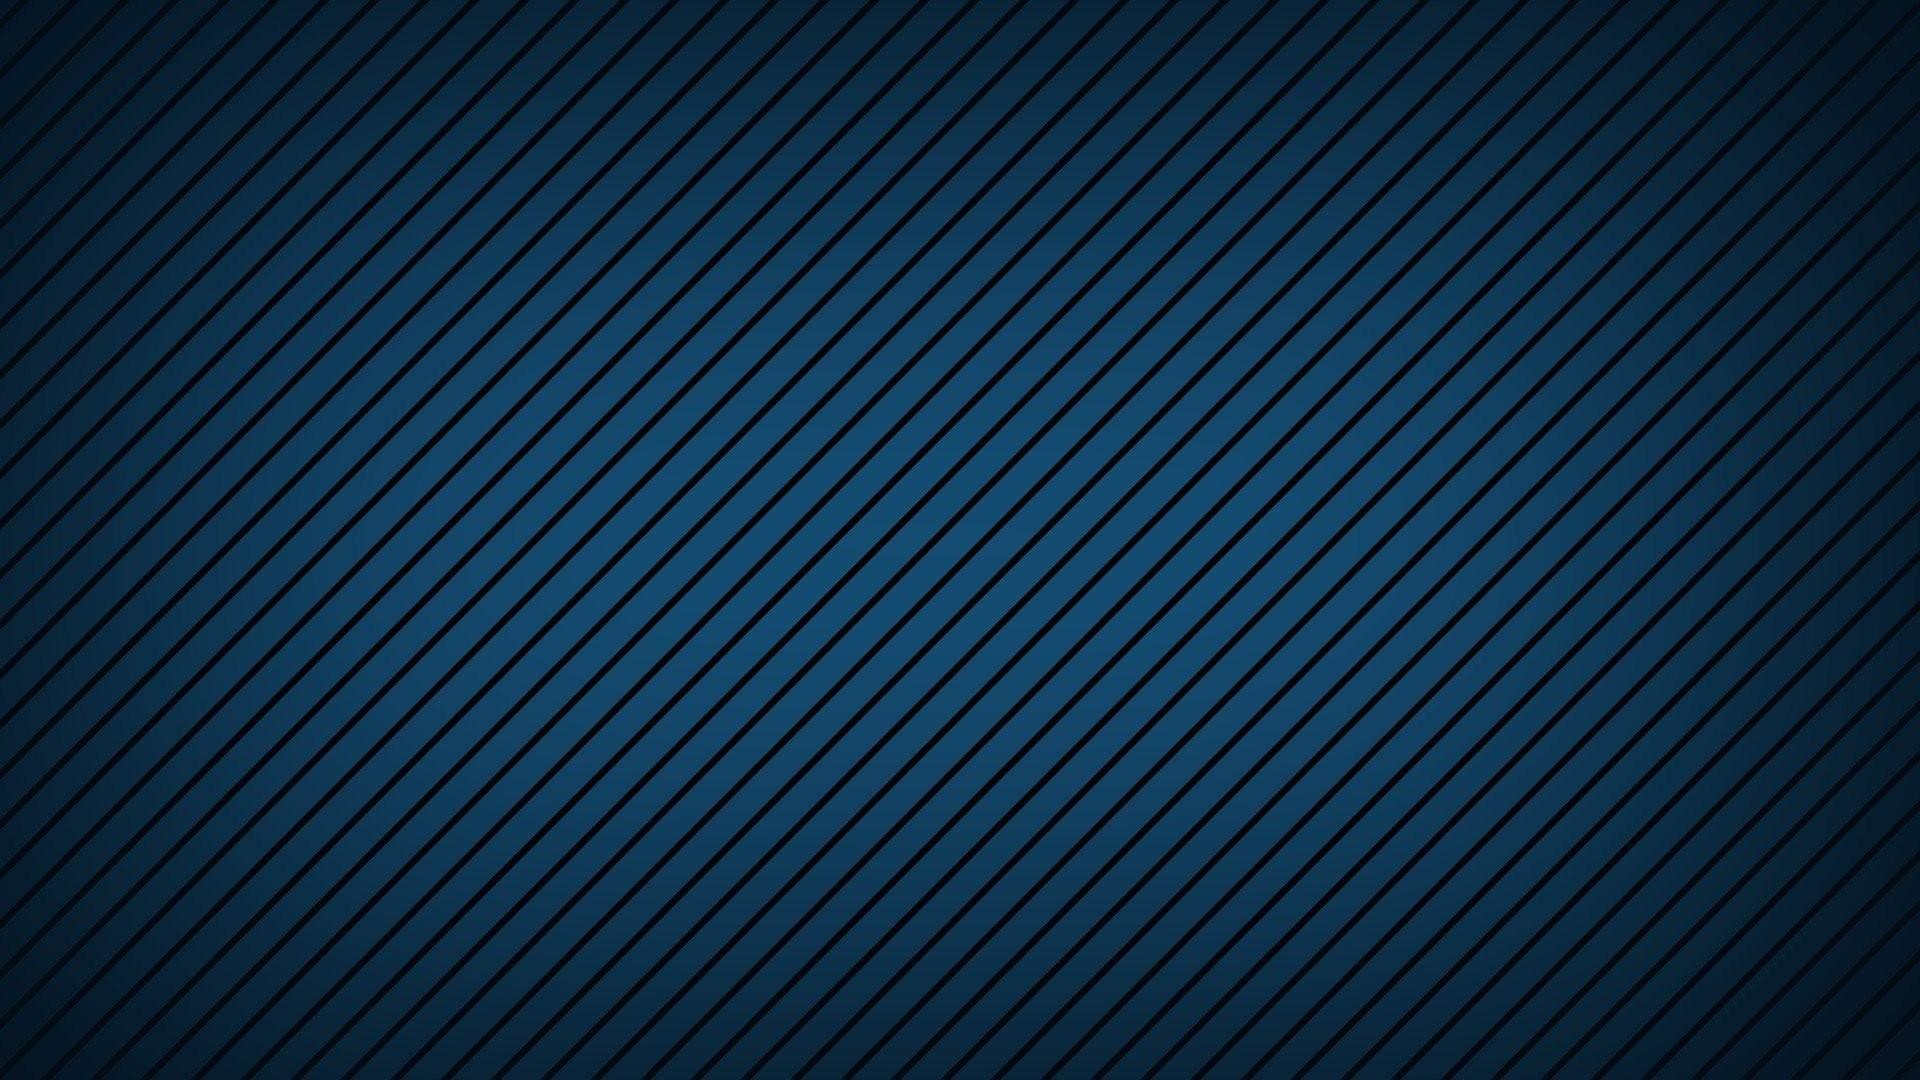 Blue Texture Wallpaper (58+ images)